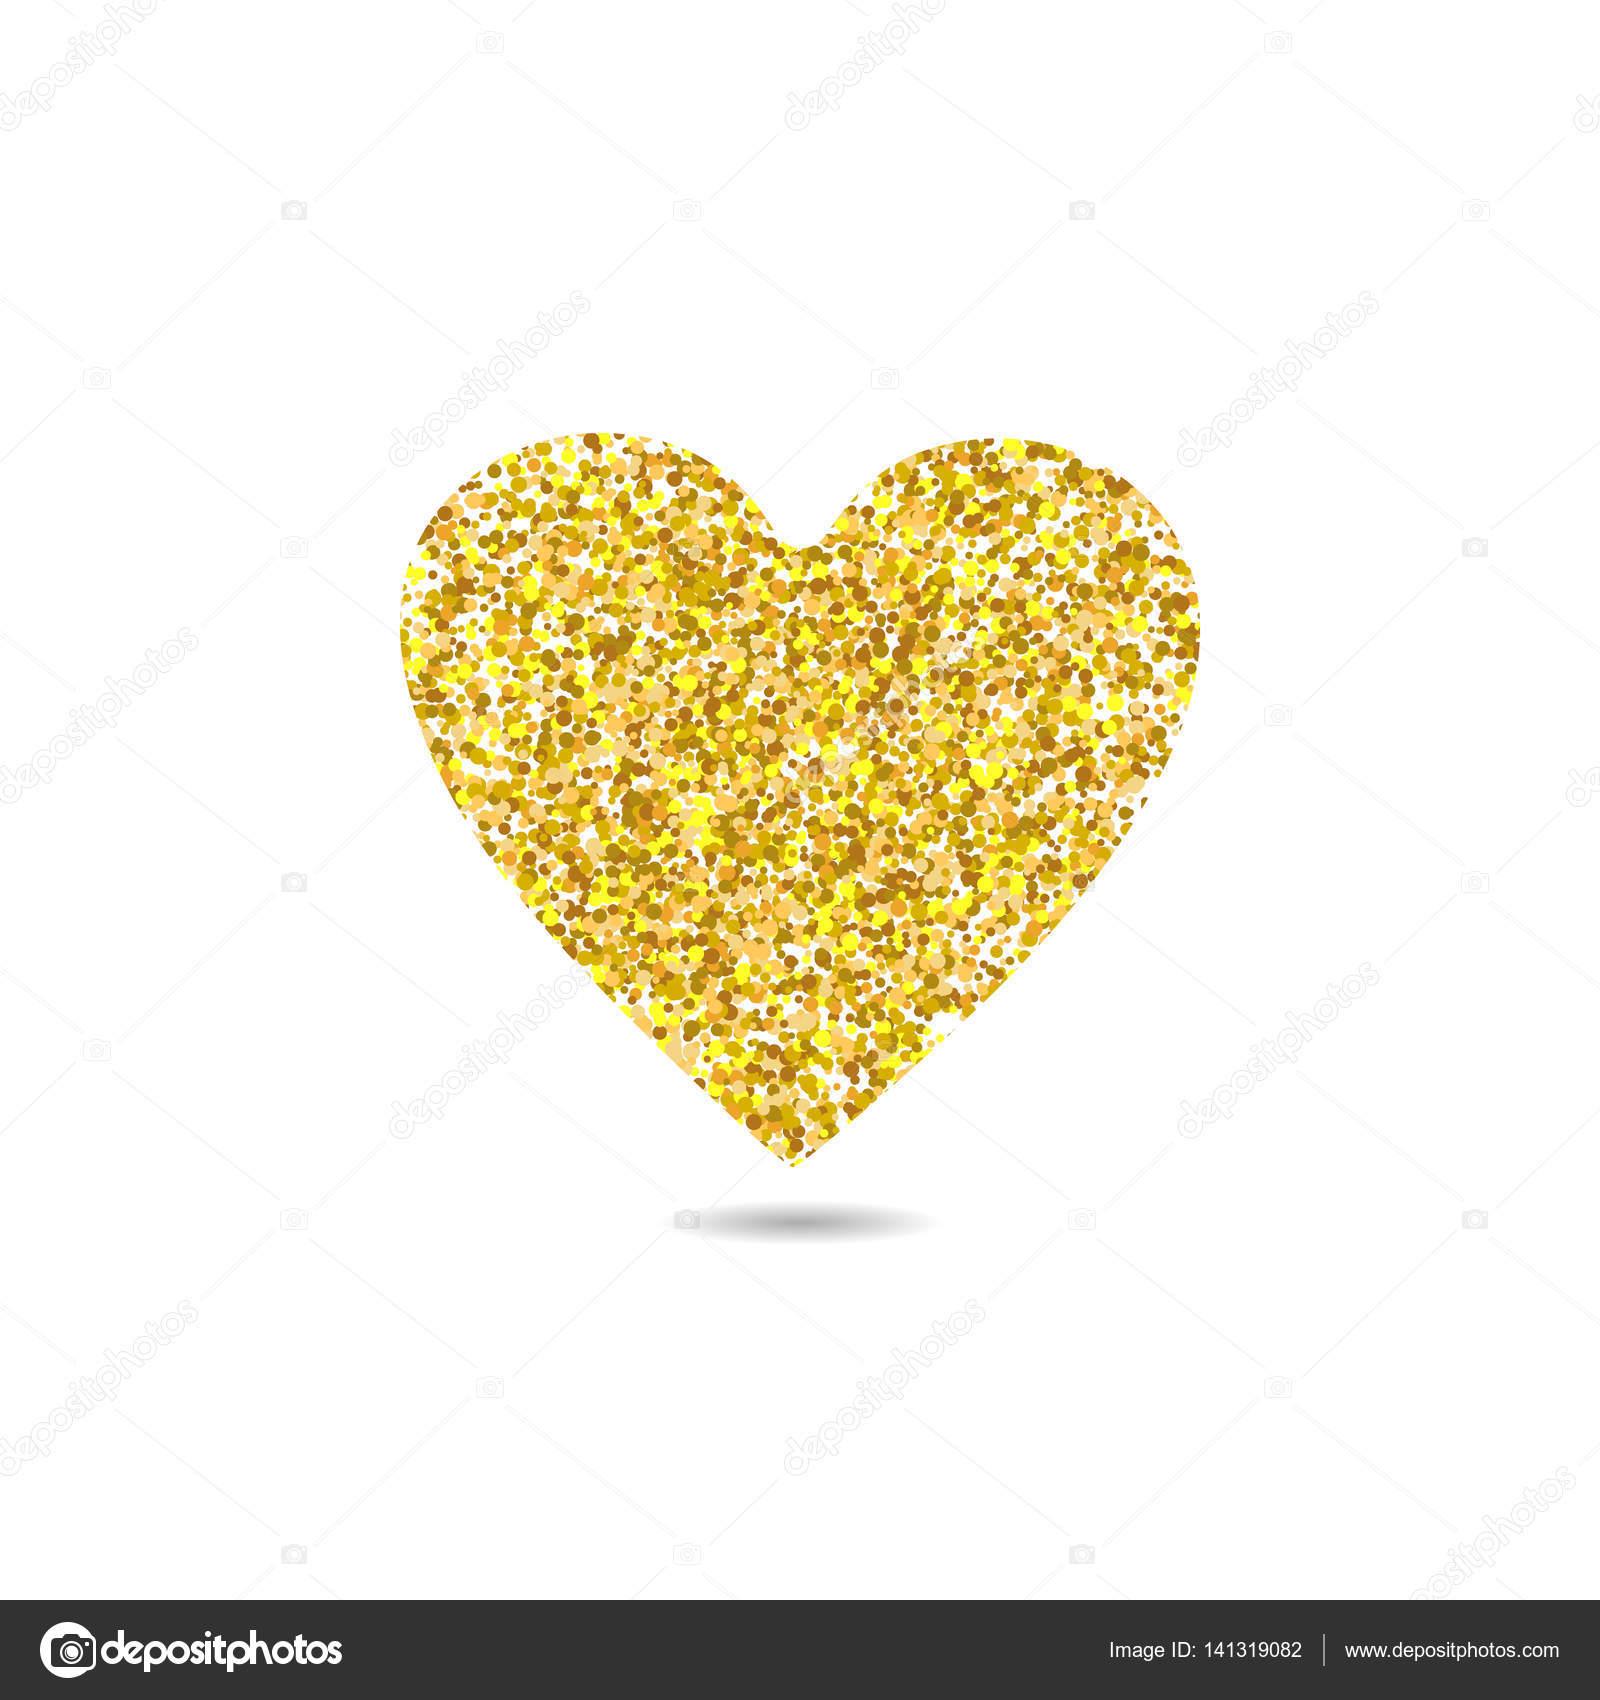 Digital <b>Glitter Hearts</b> Clipart, Sparkly Glittery <b>Heart</b>, Gold ...